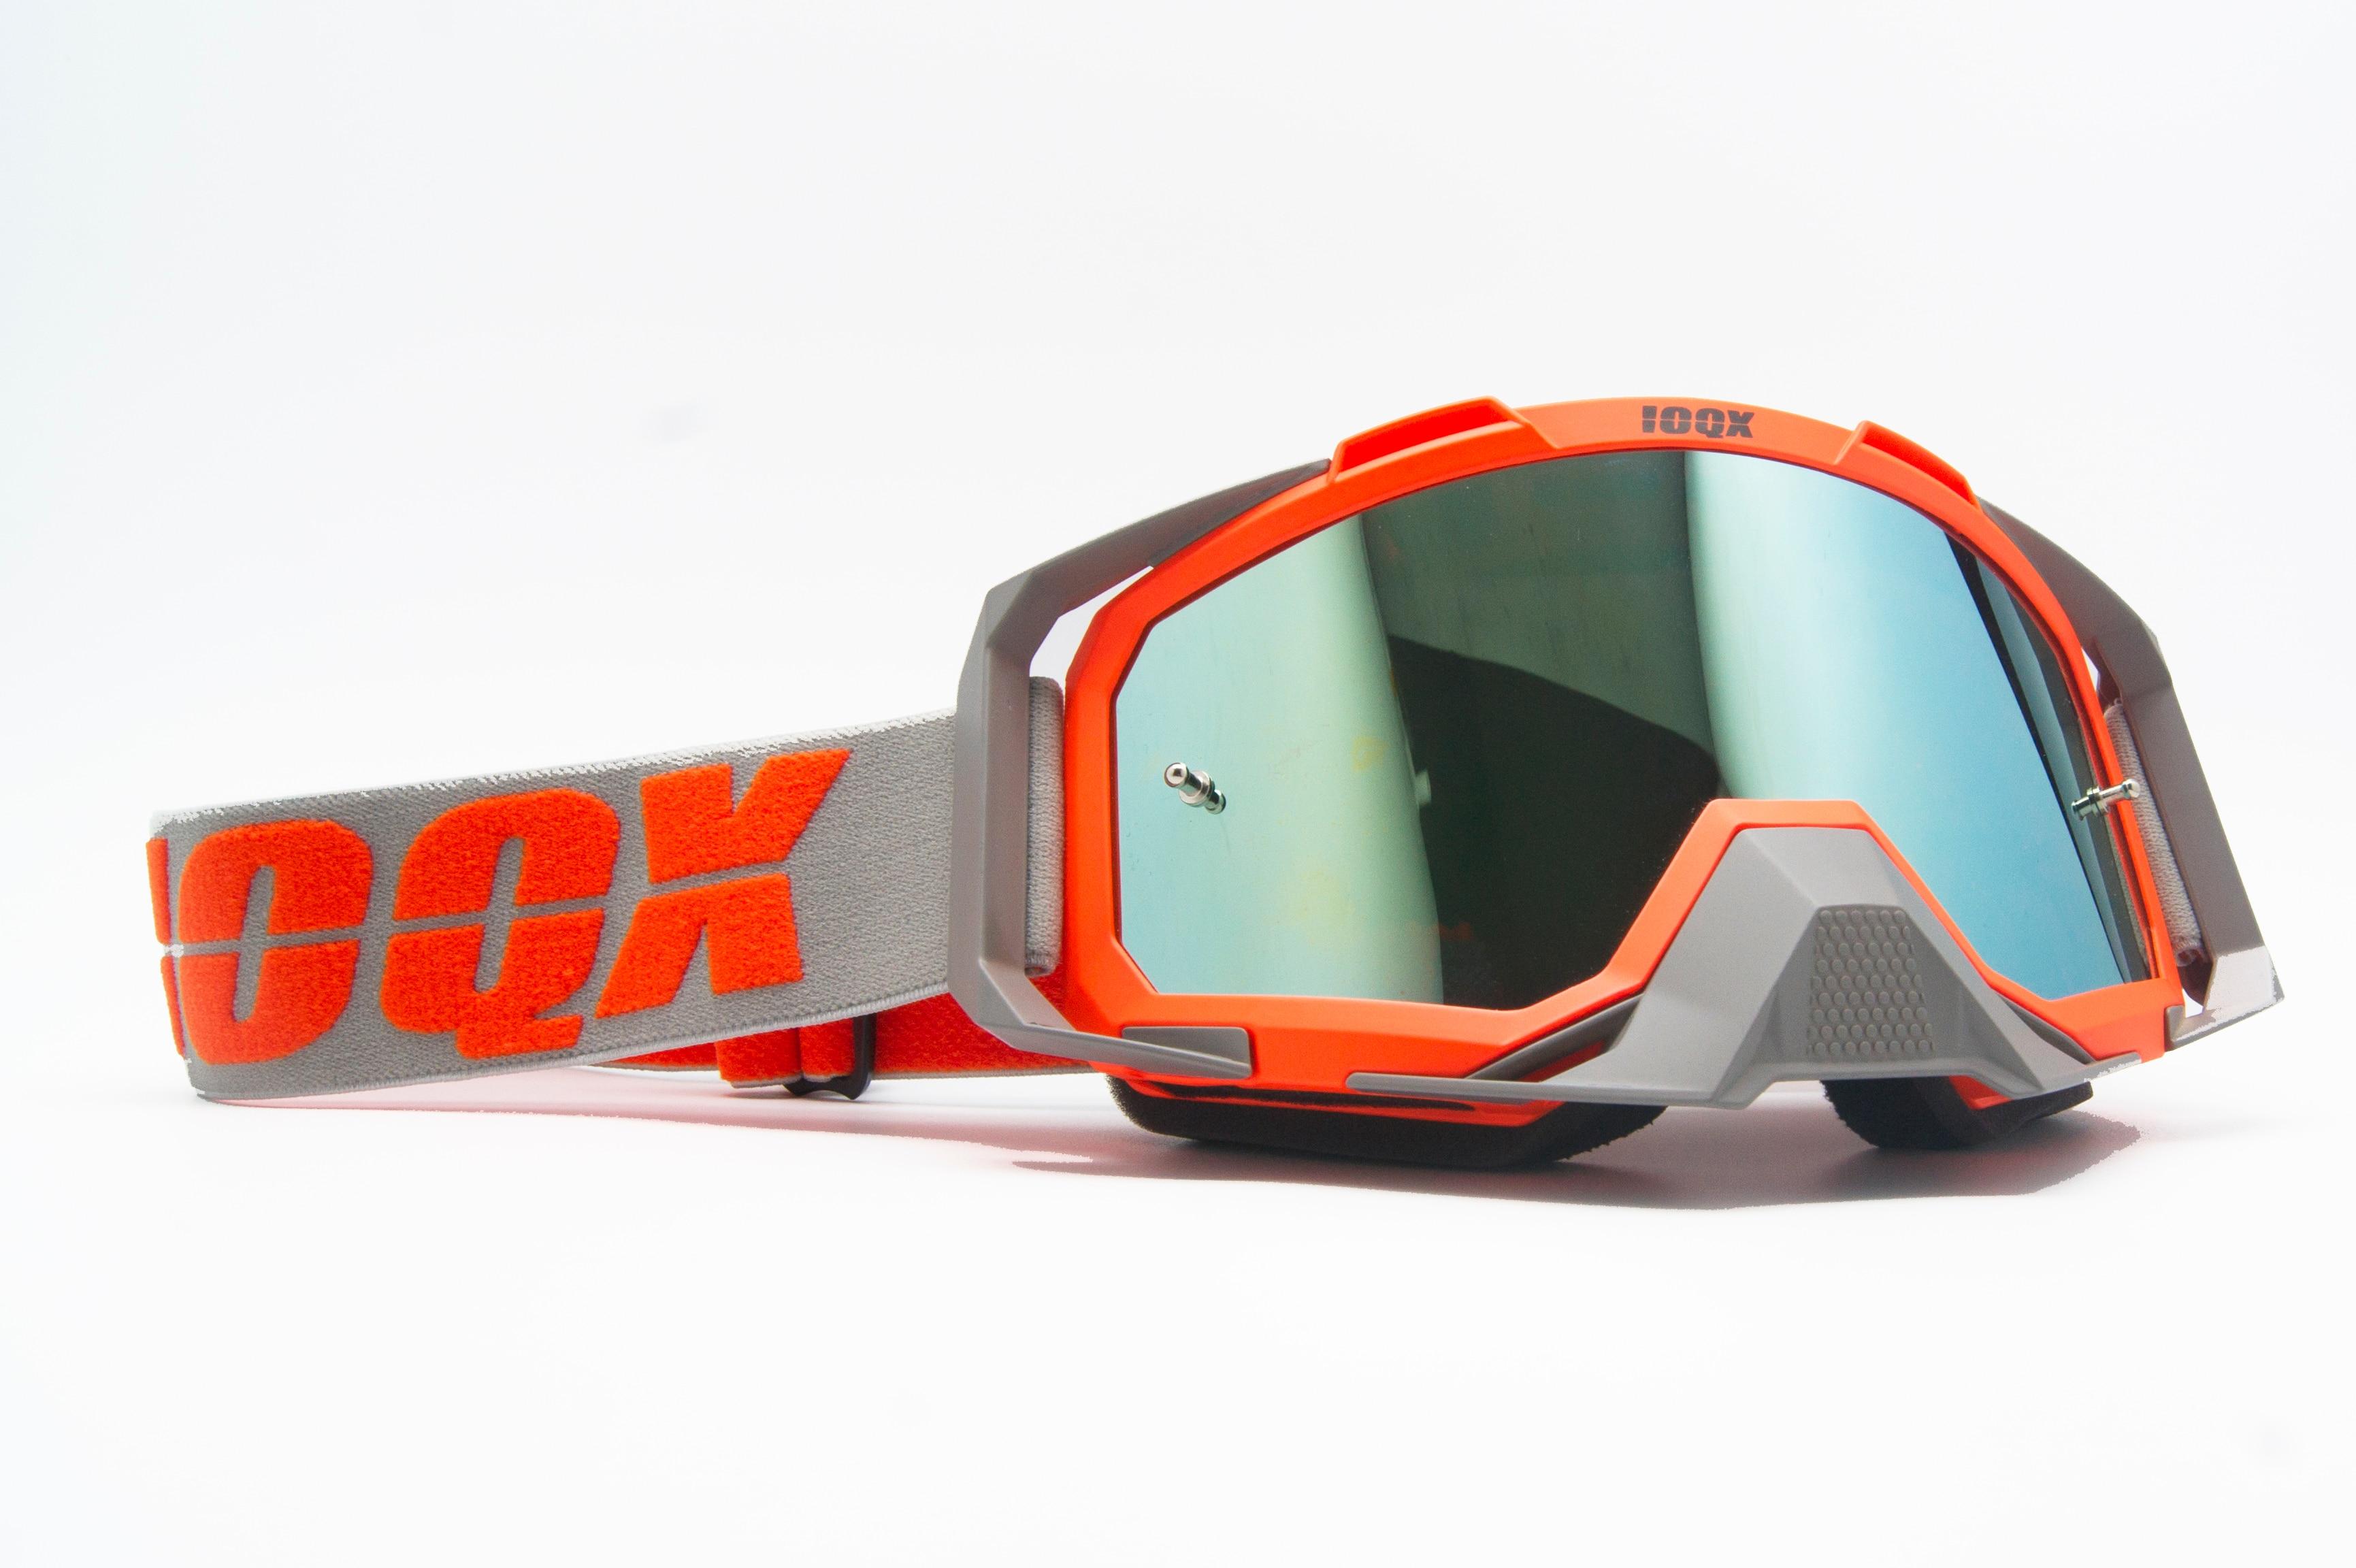 IOQX Motorcycle Protective Gears Flexible Cross Helmet Face Mask Motocross Goggles ATV Dirt Bike UTV Eyewear Gear Glasses enlarge